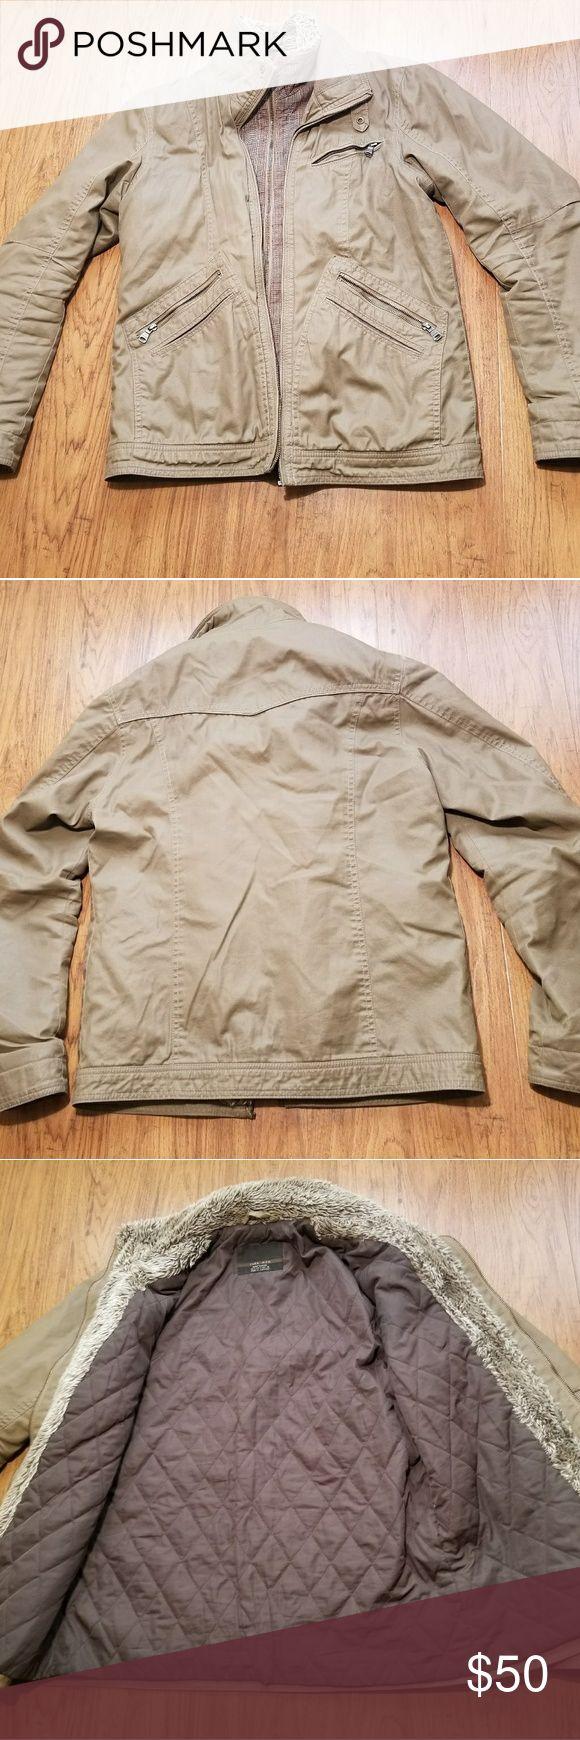 Zara Man Zip Up Jacket Size: Mens Small Color: Tan Price: $49.99 Free Shipping Zara Man Jackets & Coats